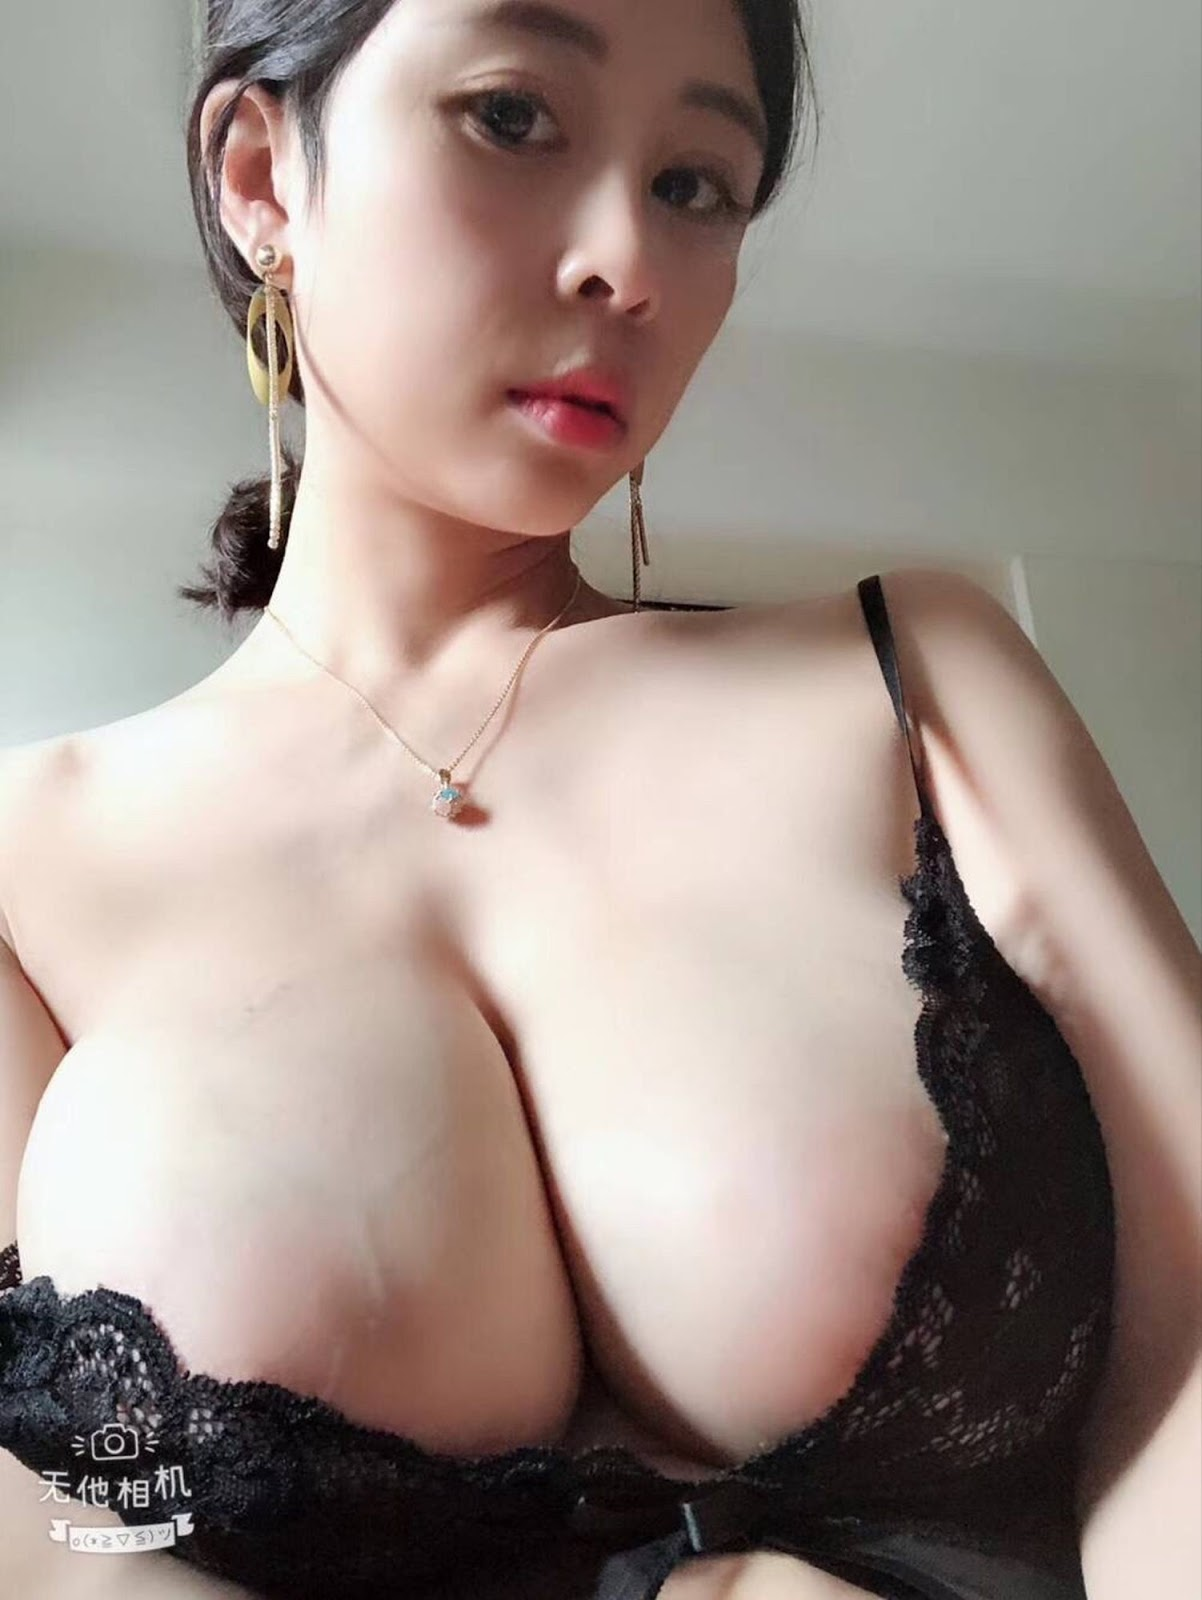 aHR0cHM6Ly93d3cubXlteXBpYy5uZXQvZGF0YS9hdHRhY2htZW50L2ZvcnVtLzIwMTkwOC8yMC8wODM0MzduYnFiMGI0dGp2NTAwbjl2LmpwZy50aHVtYi5qcGc%253D - 成都瓶儿 - Chengdu Pinger big tits selfie nude 2020